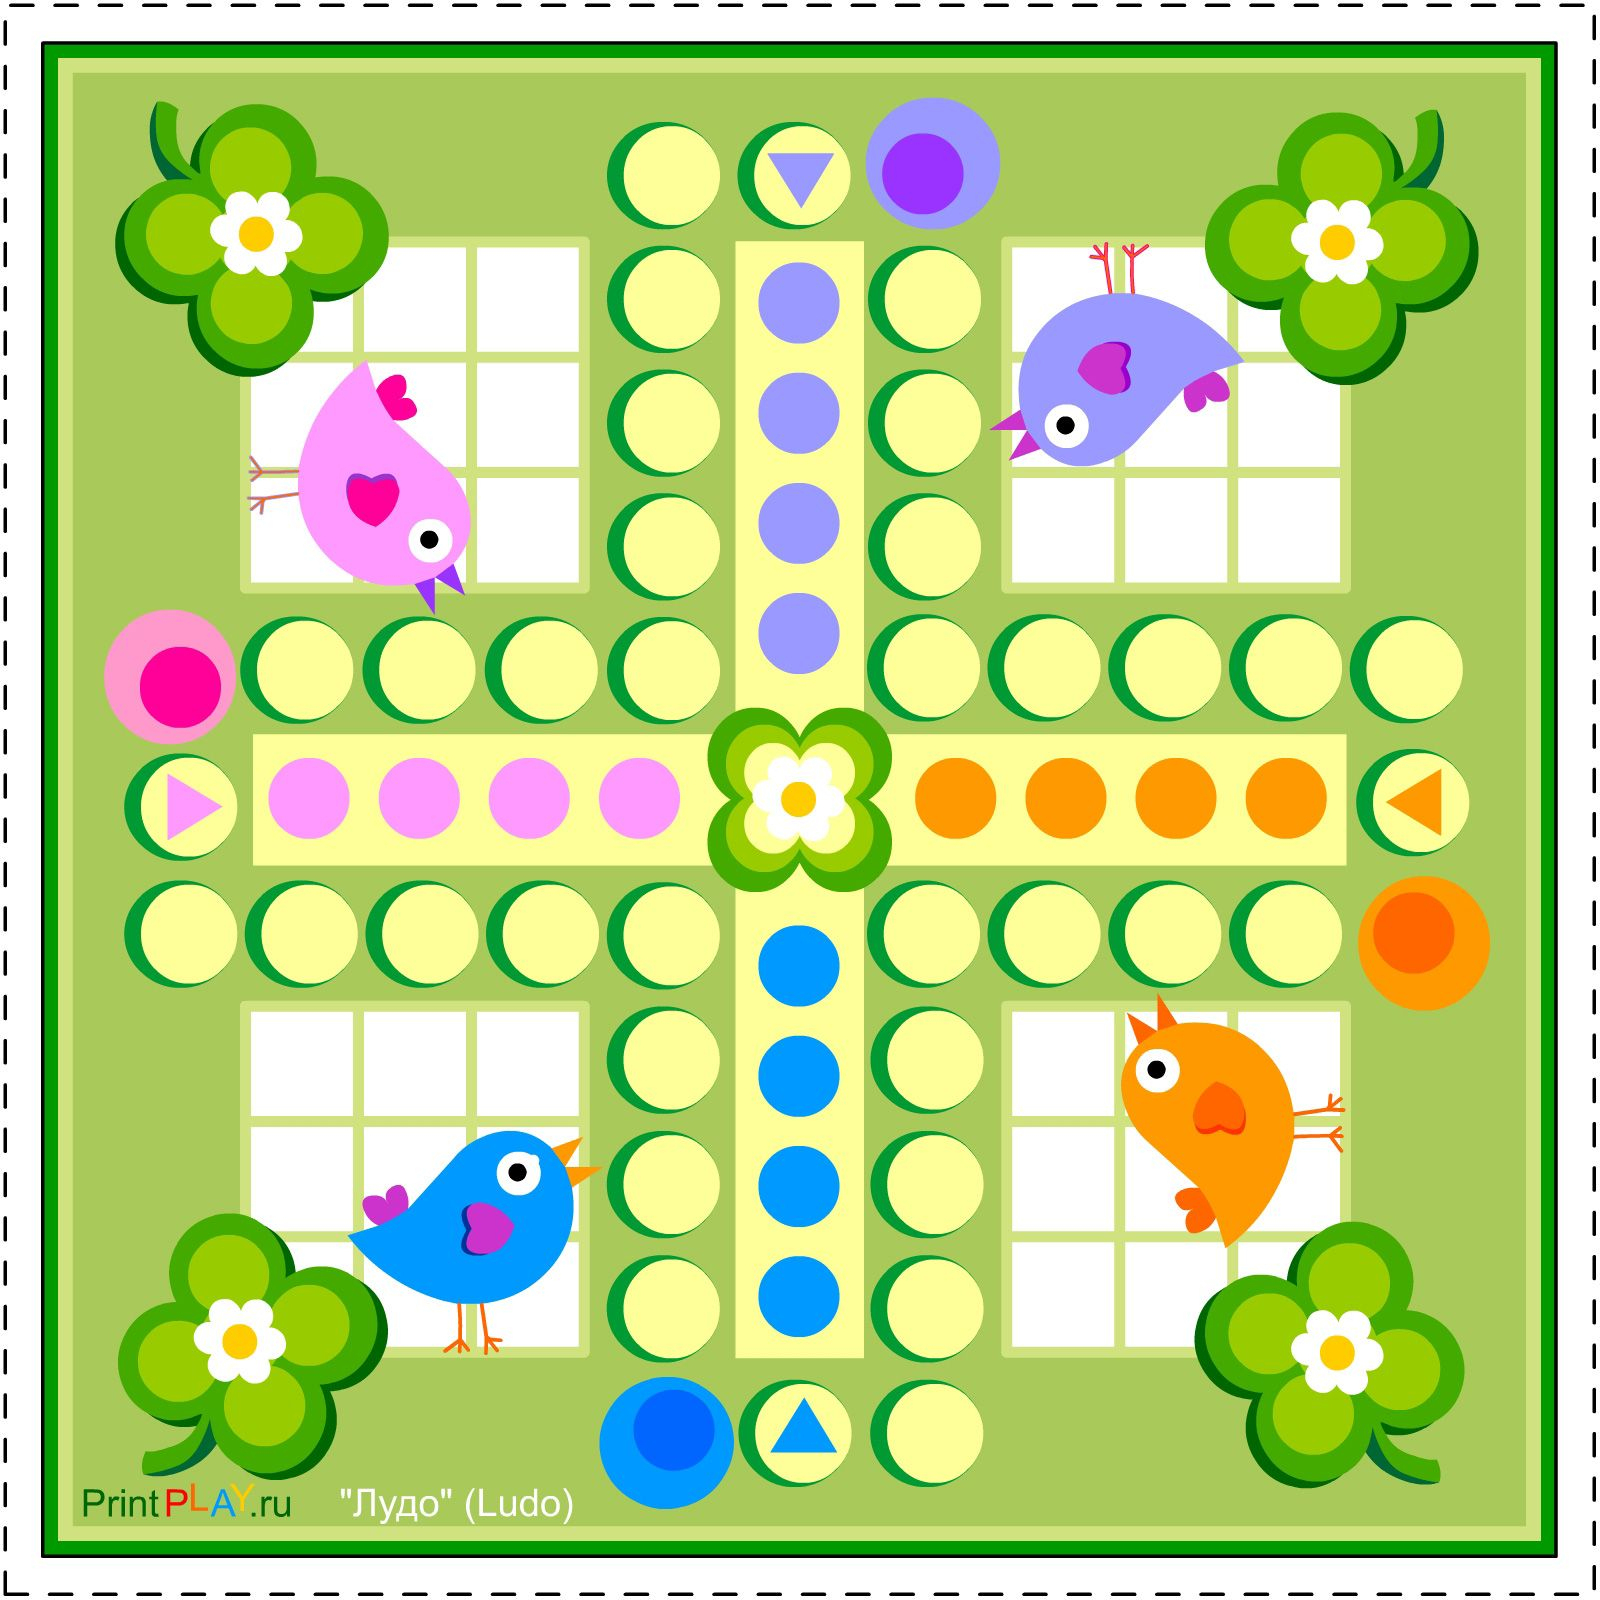 2014-08) Ludo Med Fugle | Jeux | Pinterest | Games, Board Games Et - Free Printable Ludo Board